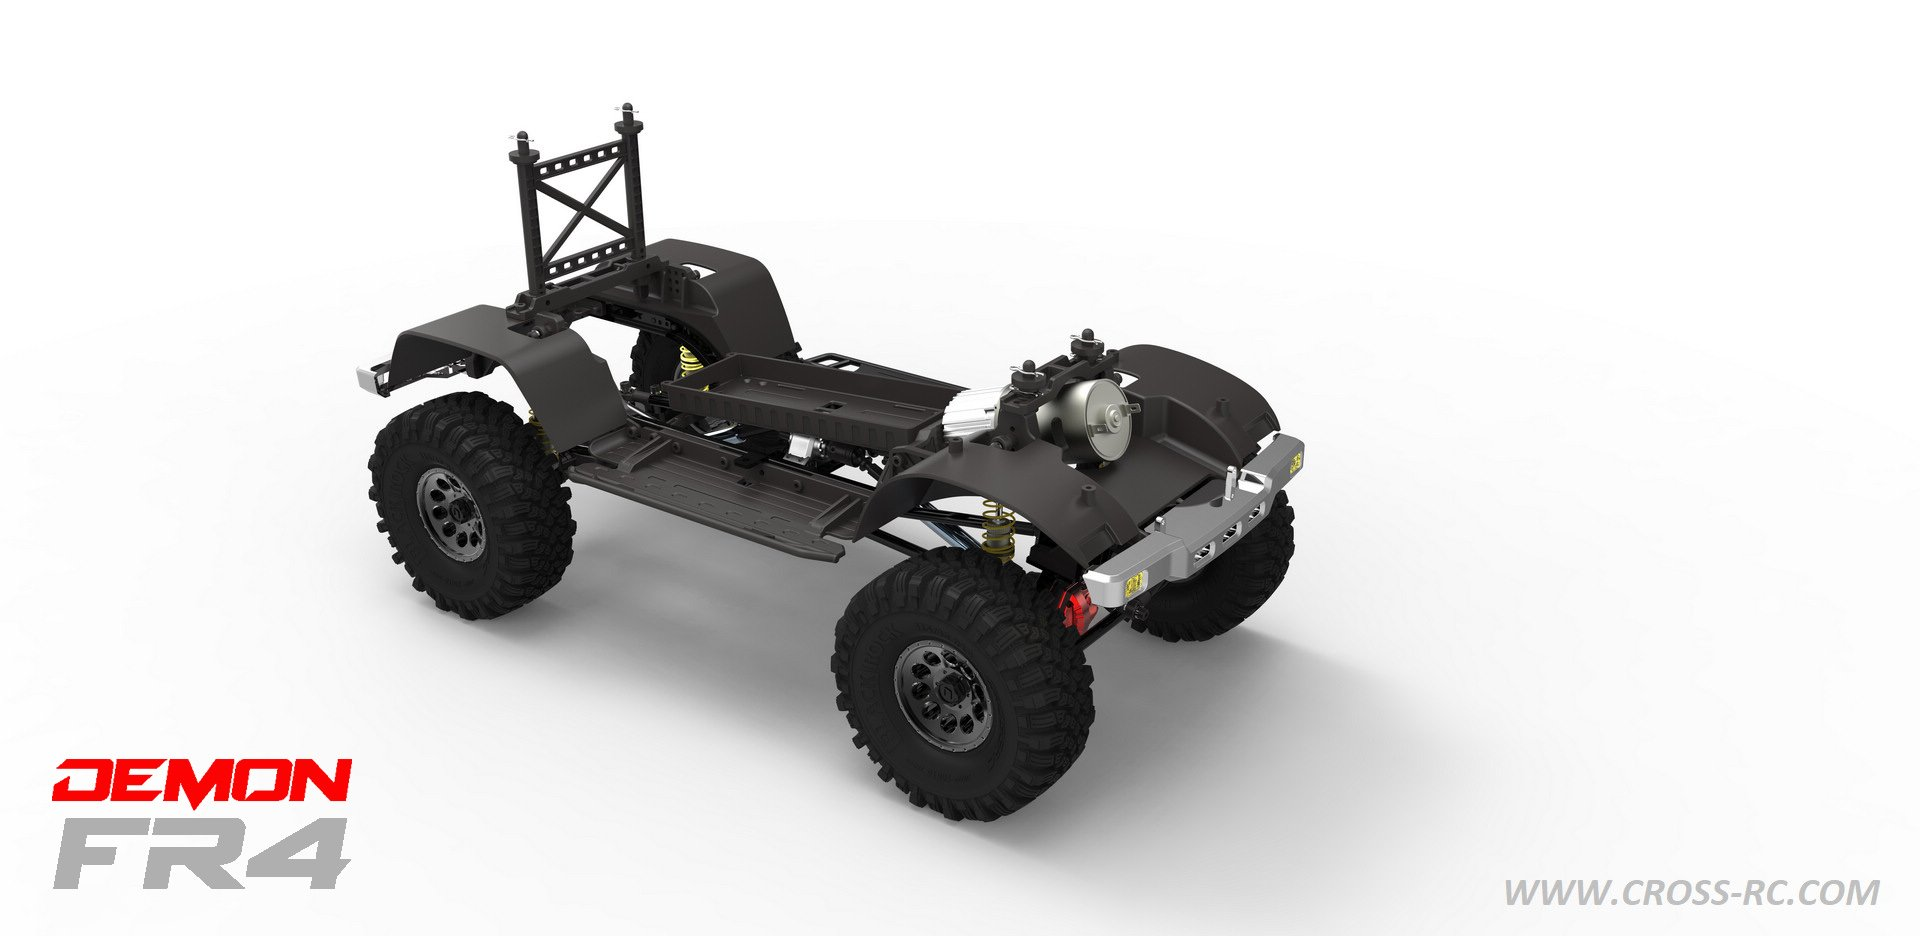 Cross RC FR4 Crawler Kit - Chassis